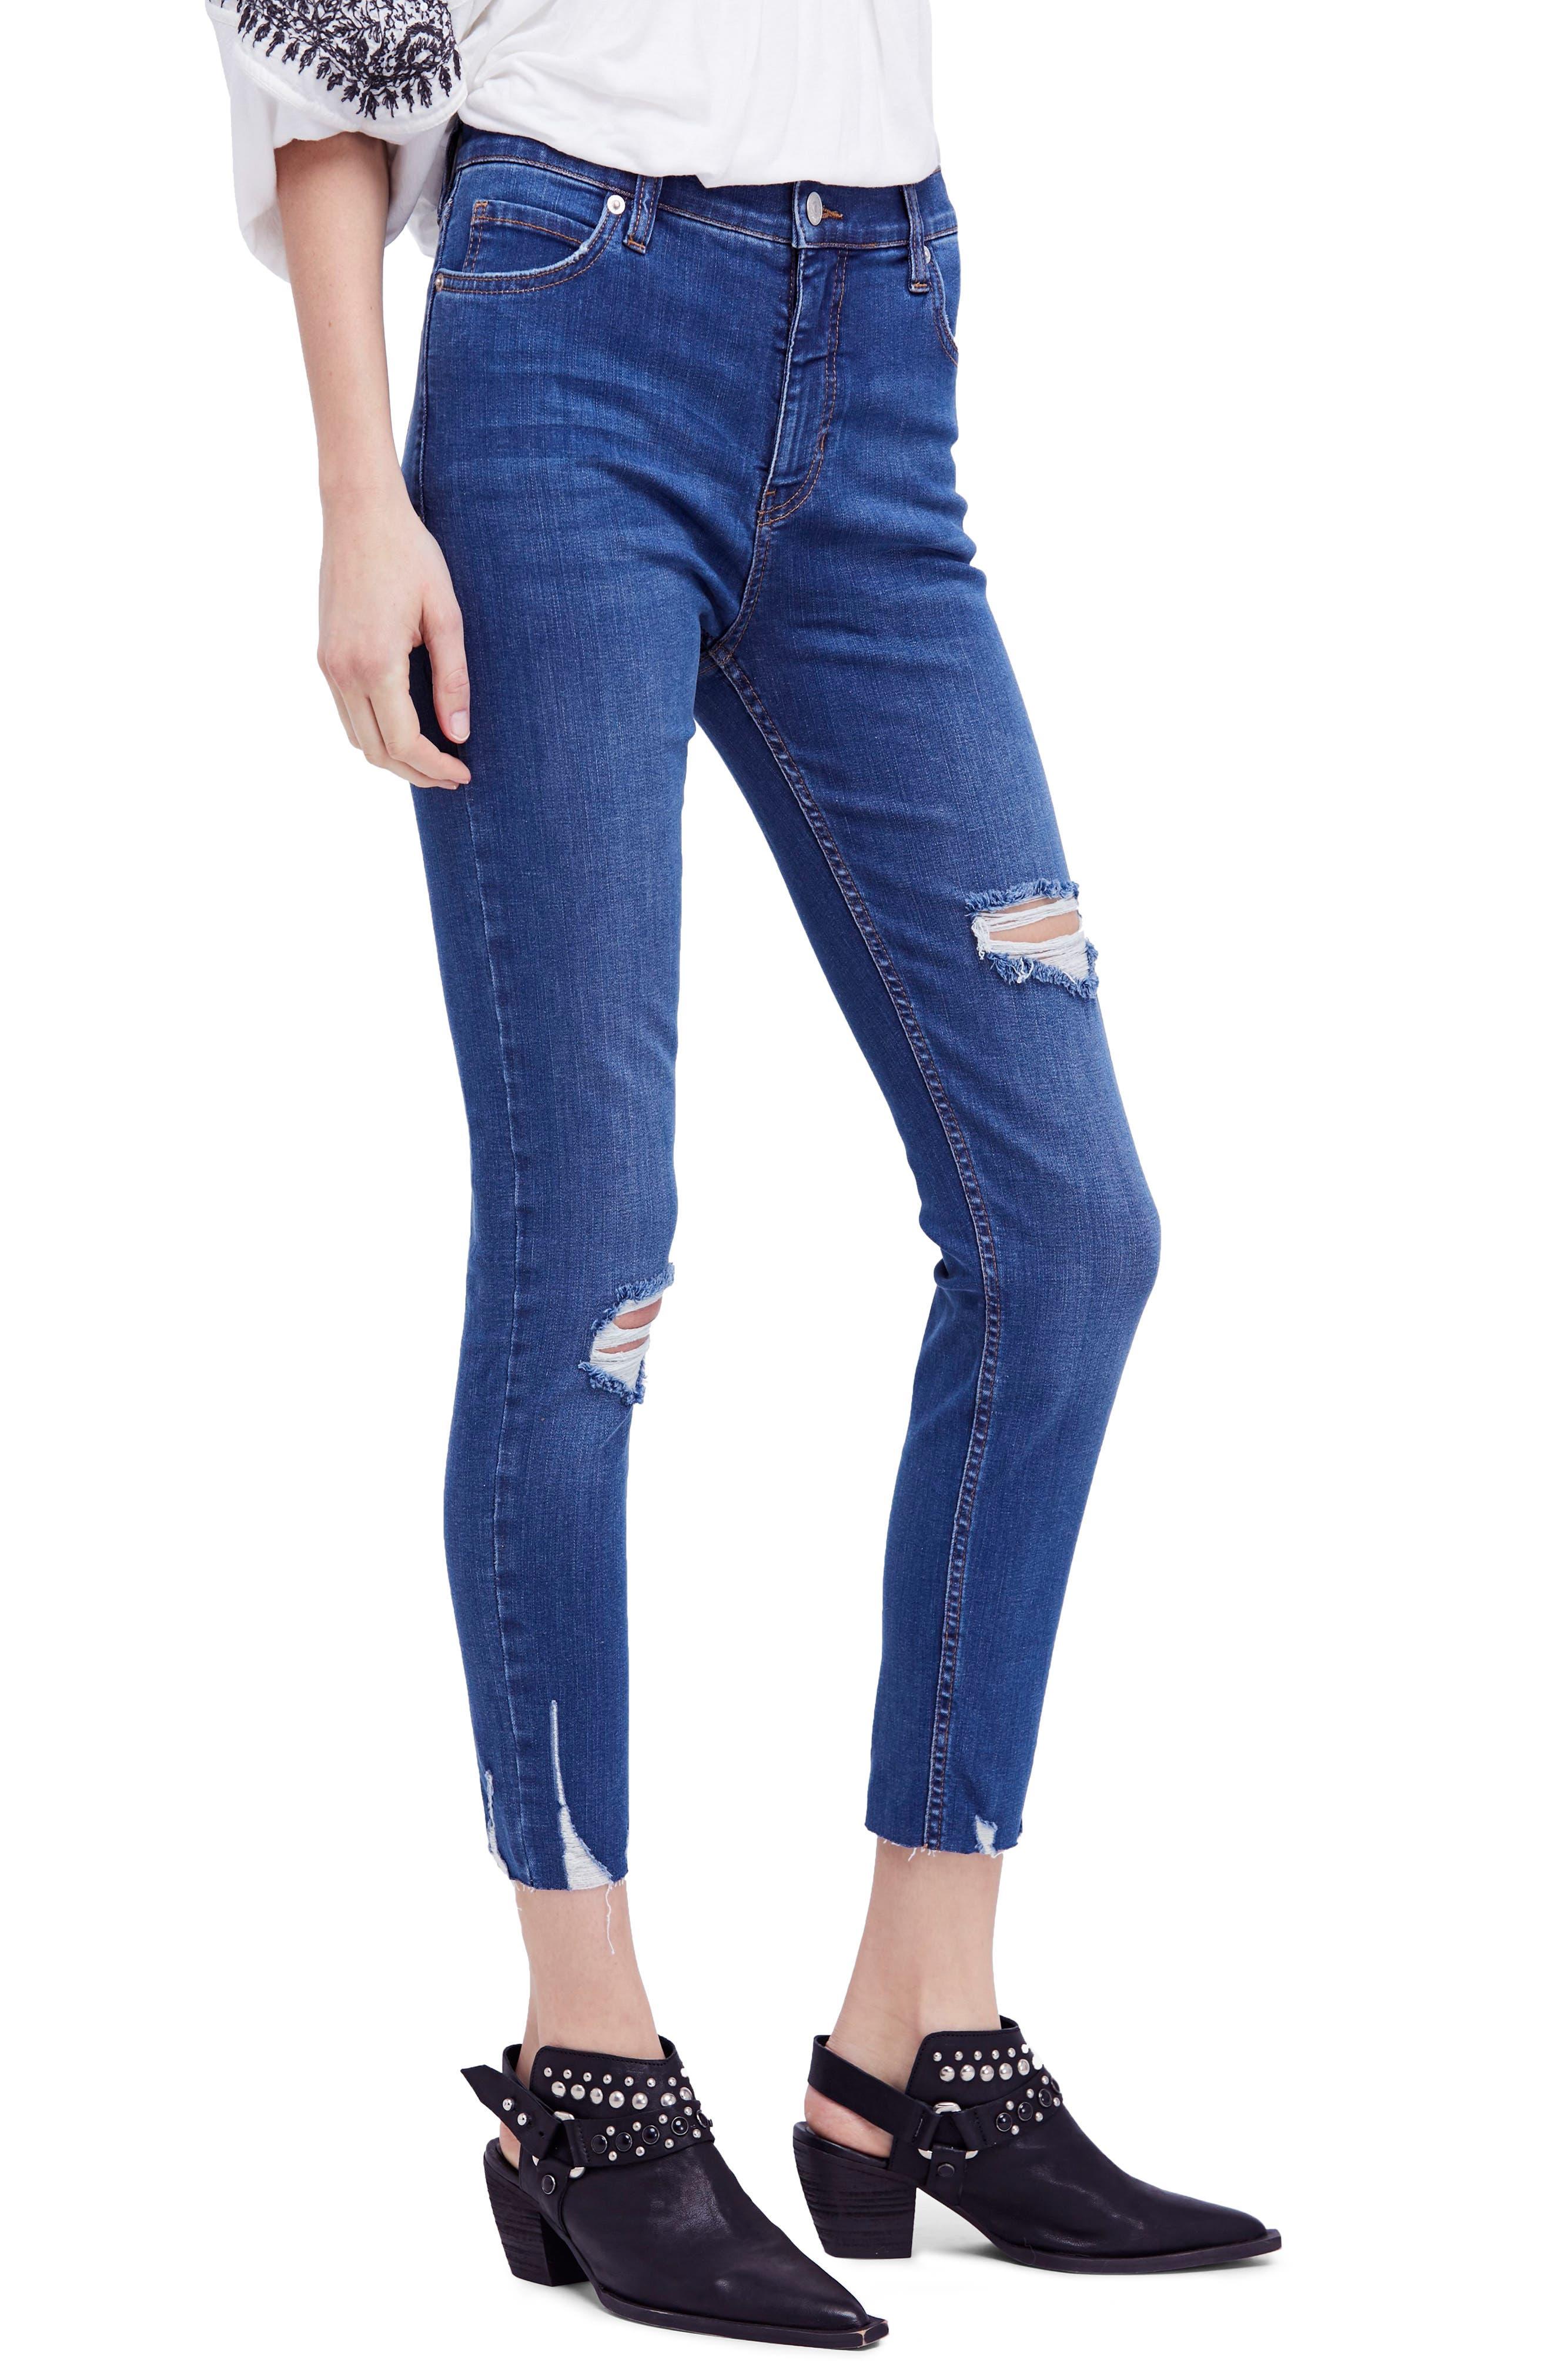 Free People Ripped Crop Skinny Jeans